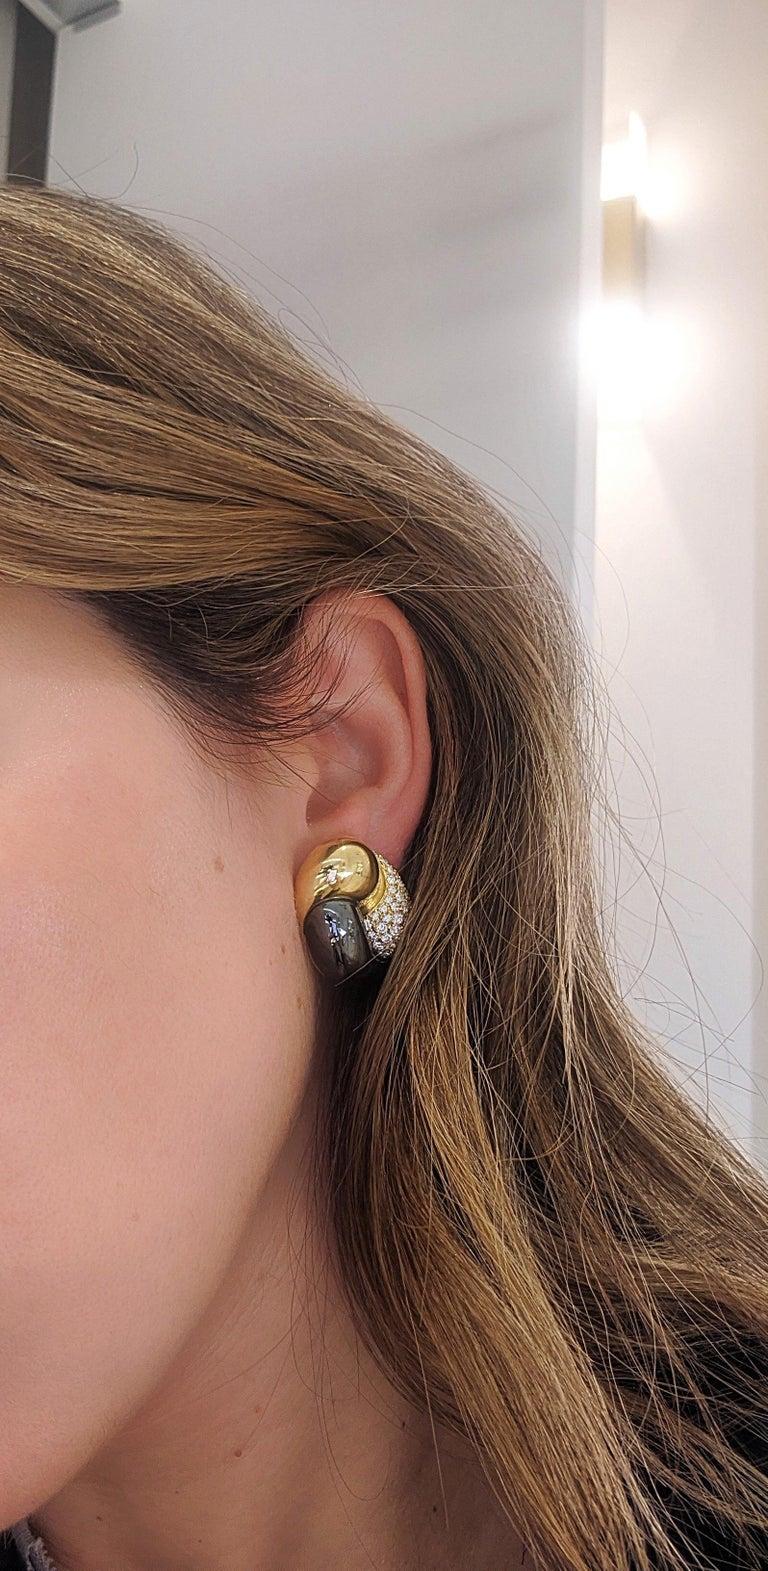 Round Cut Picchiotti 18 Karat Yellow Gold, 2.27 Carat, Diamond and Hematite Earrings For Sale